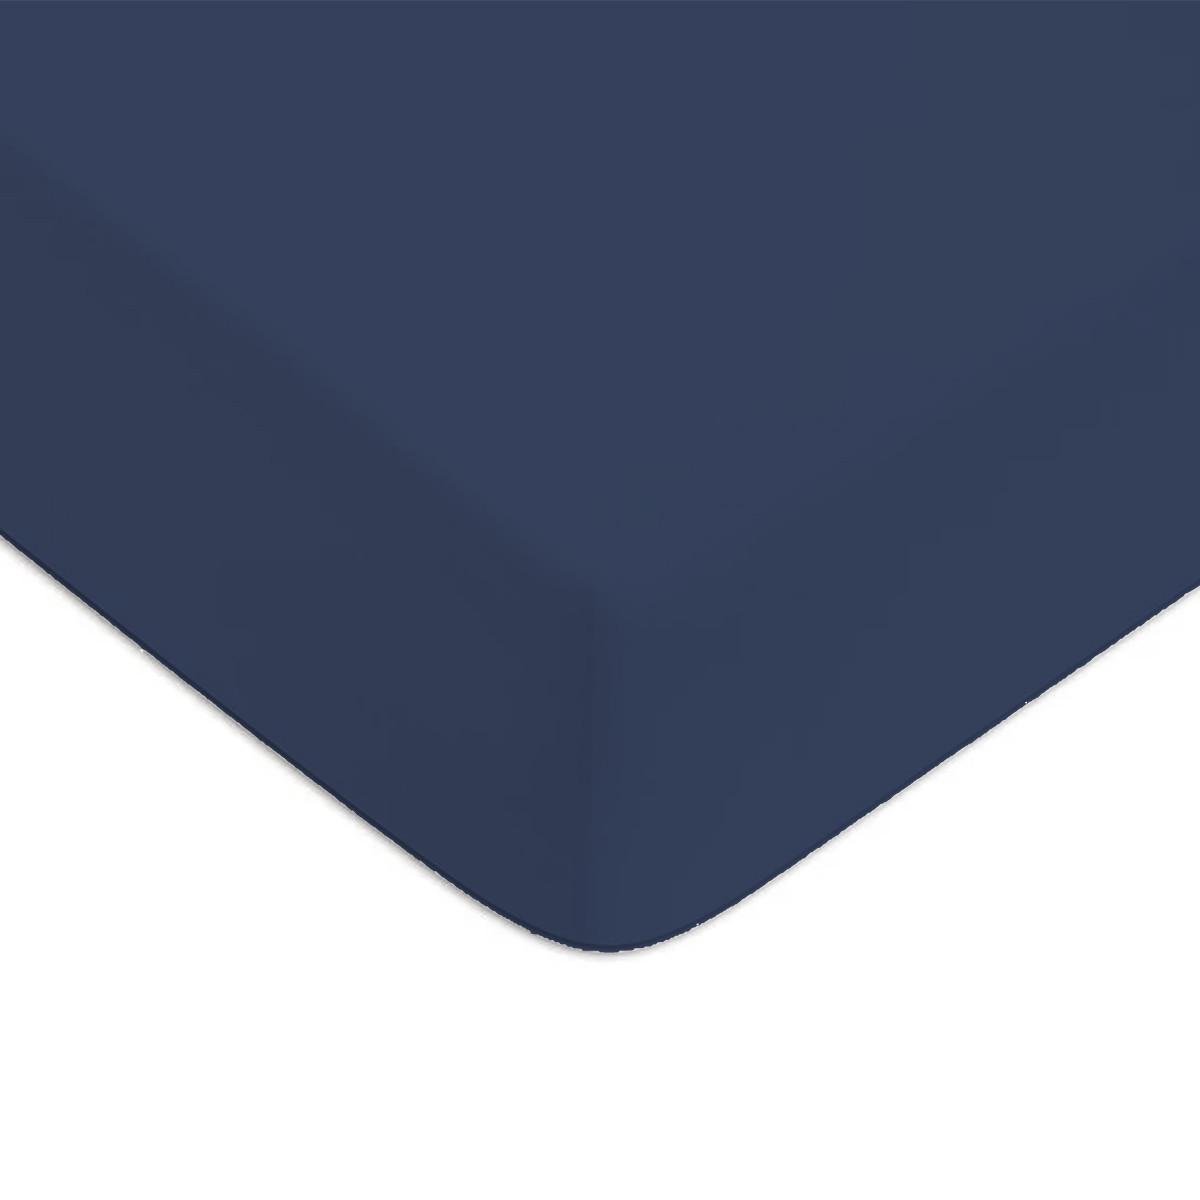 Drap housse Bleu 140x200cm 57 fils